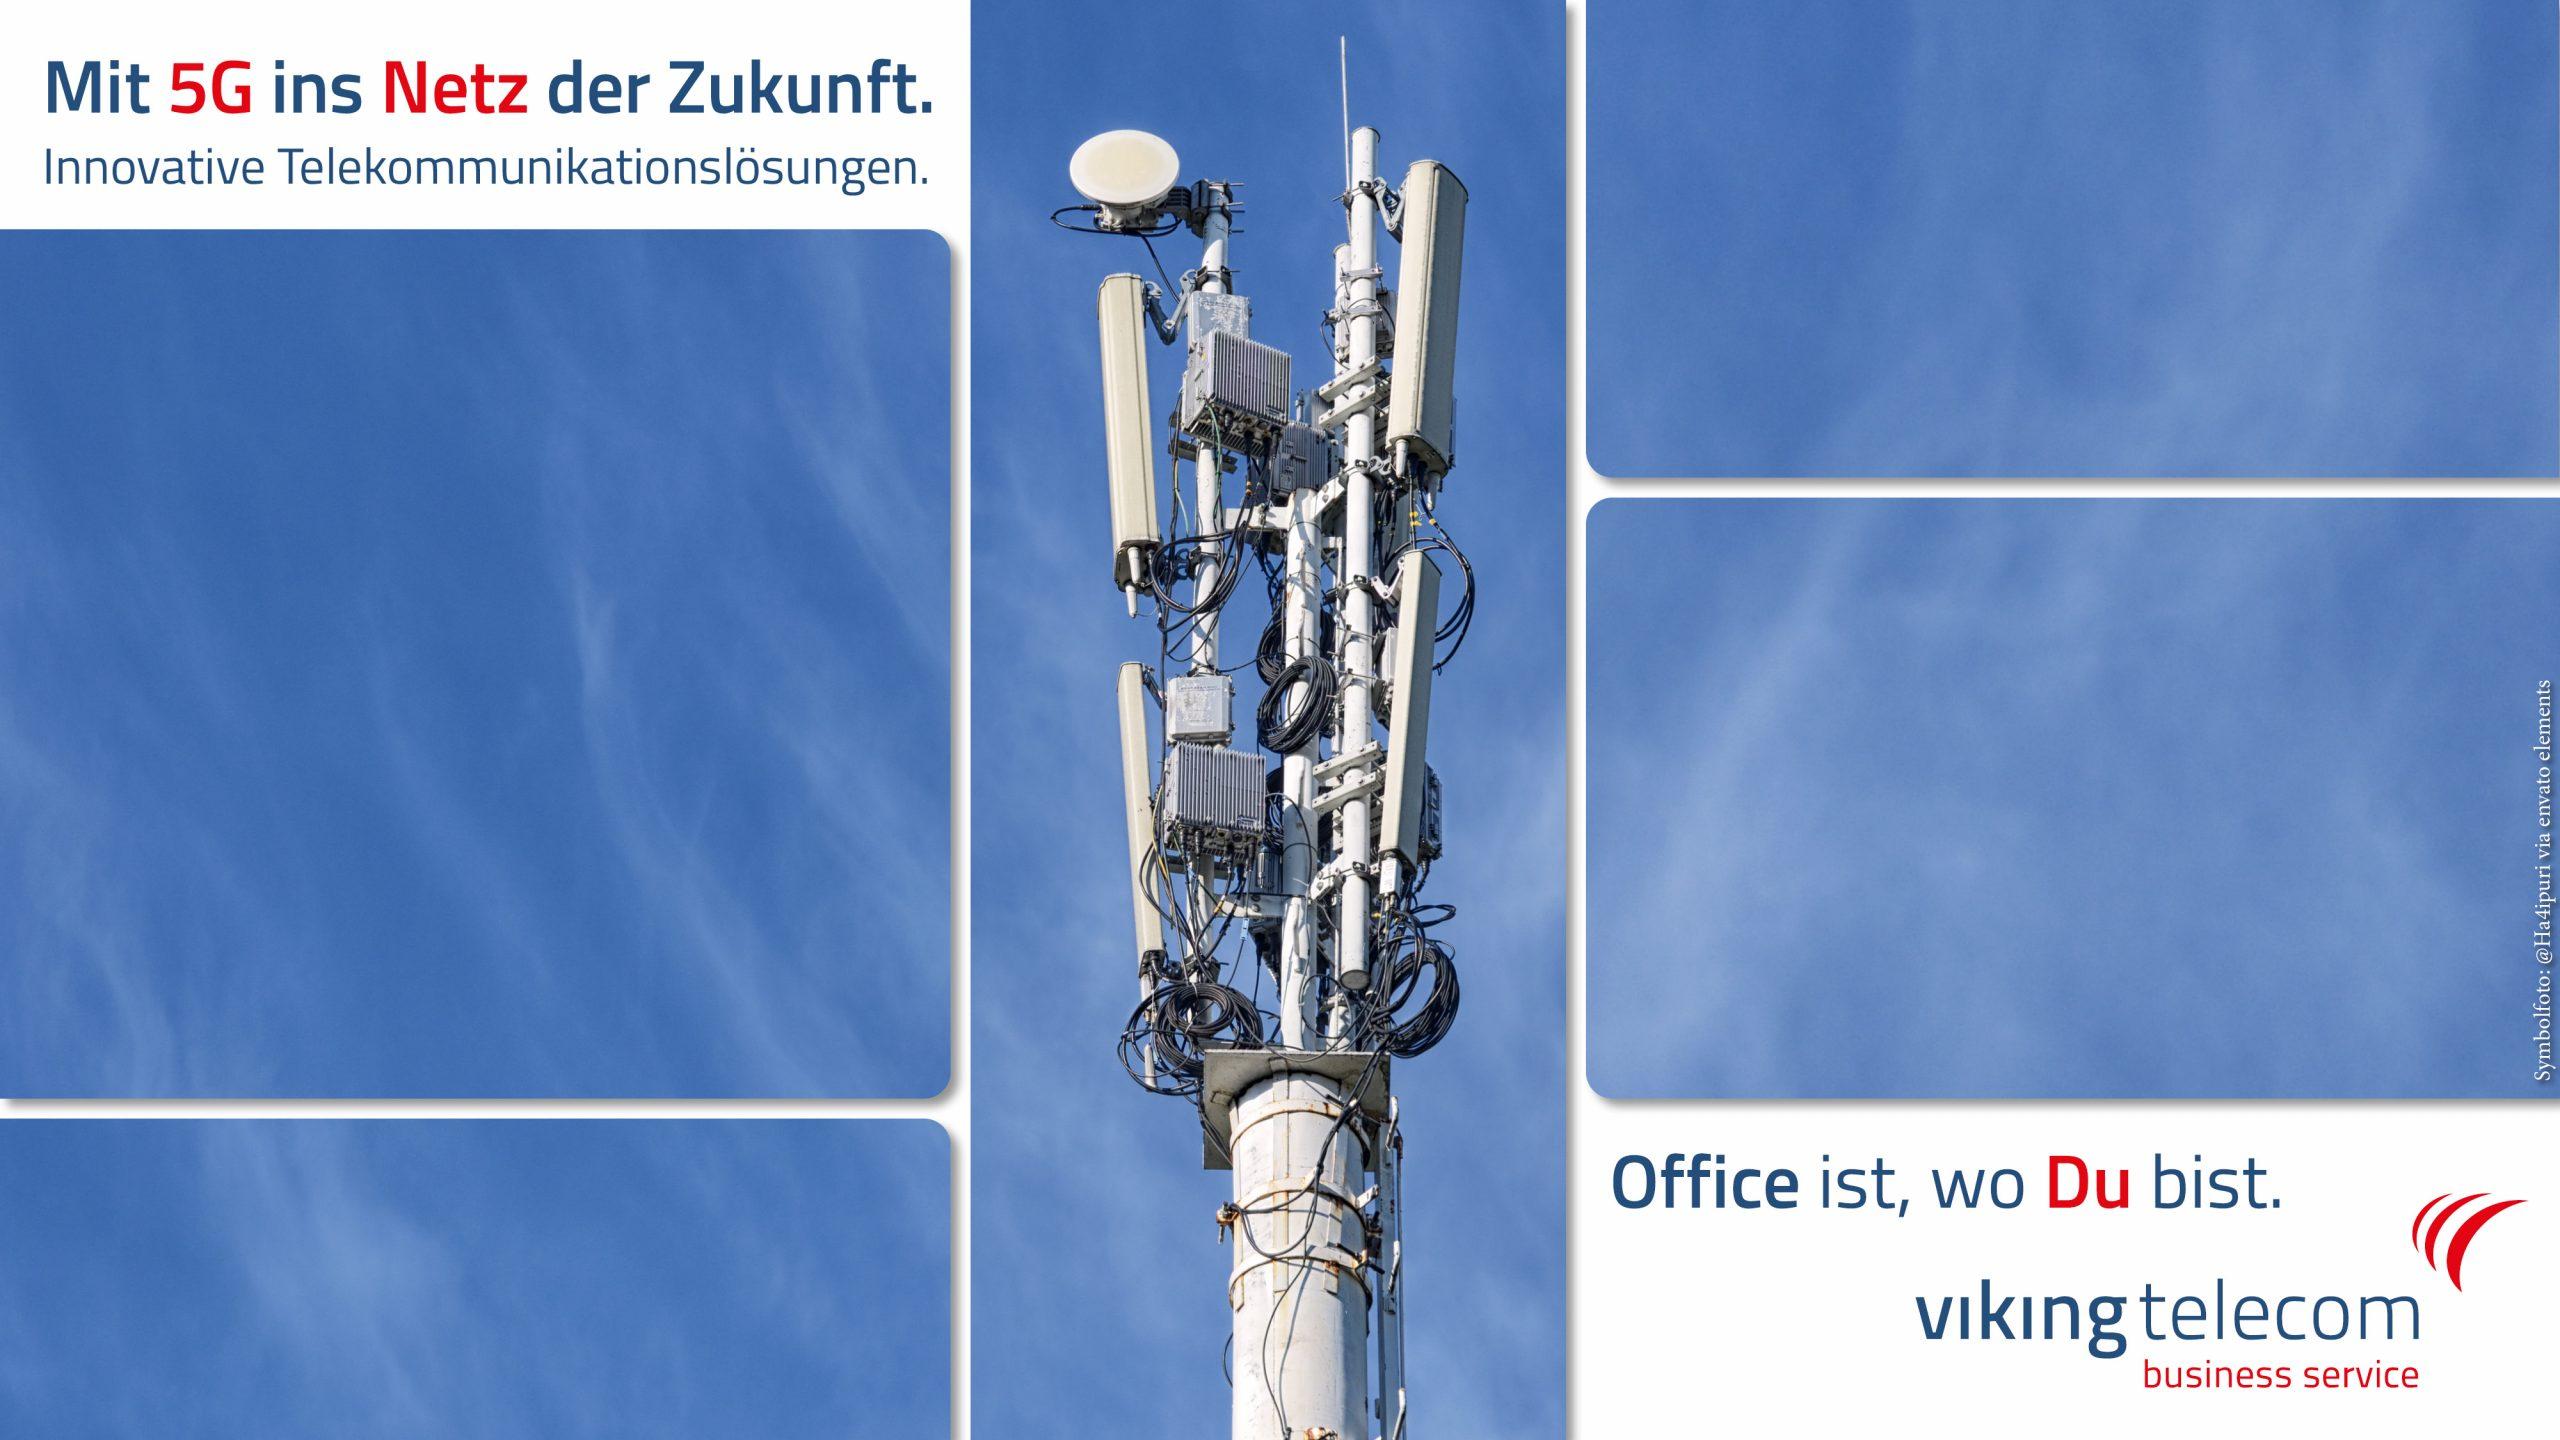 20G Das neue Netz erobert Deutschland   Viking Telecom Business ...